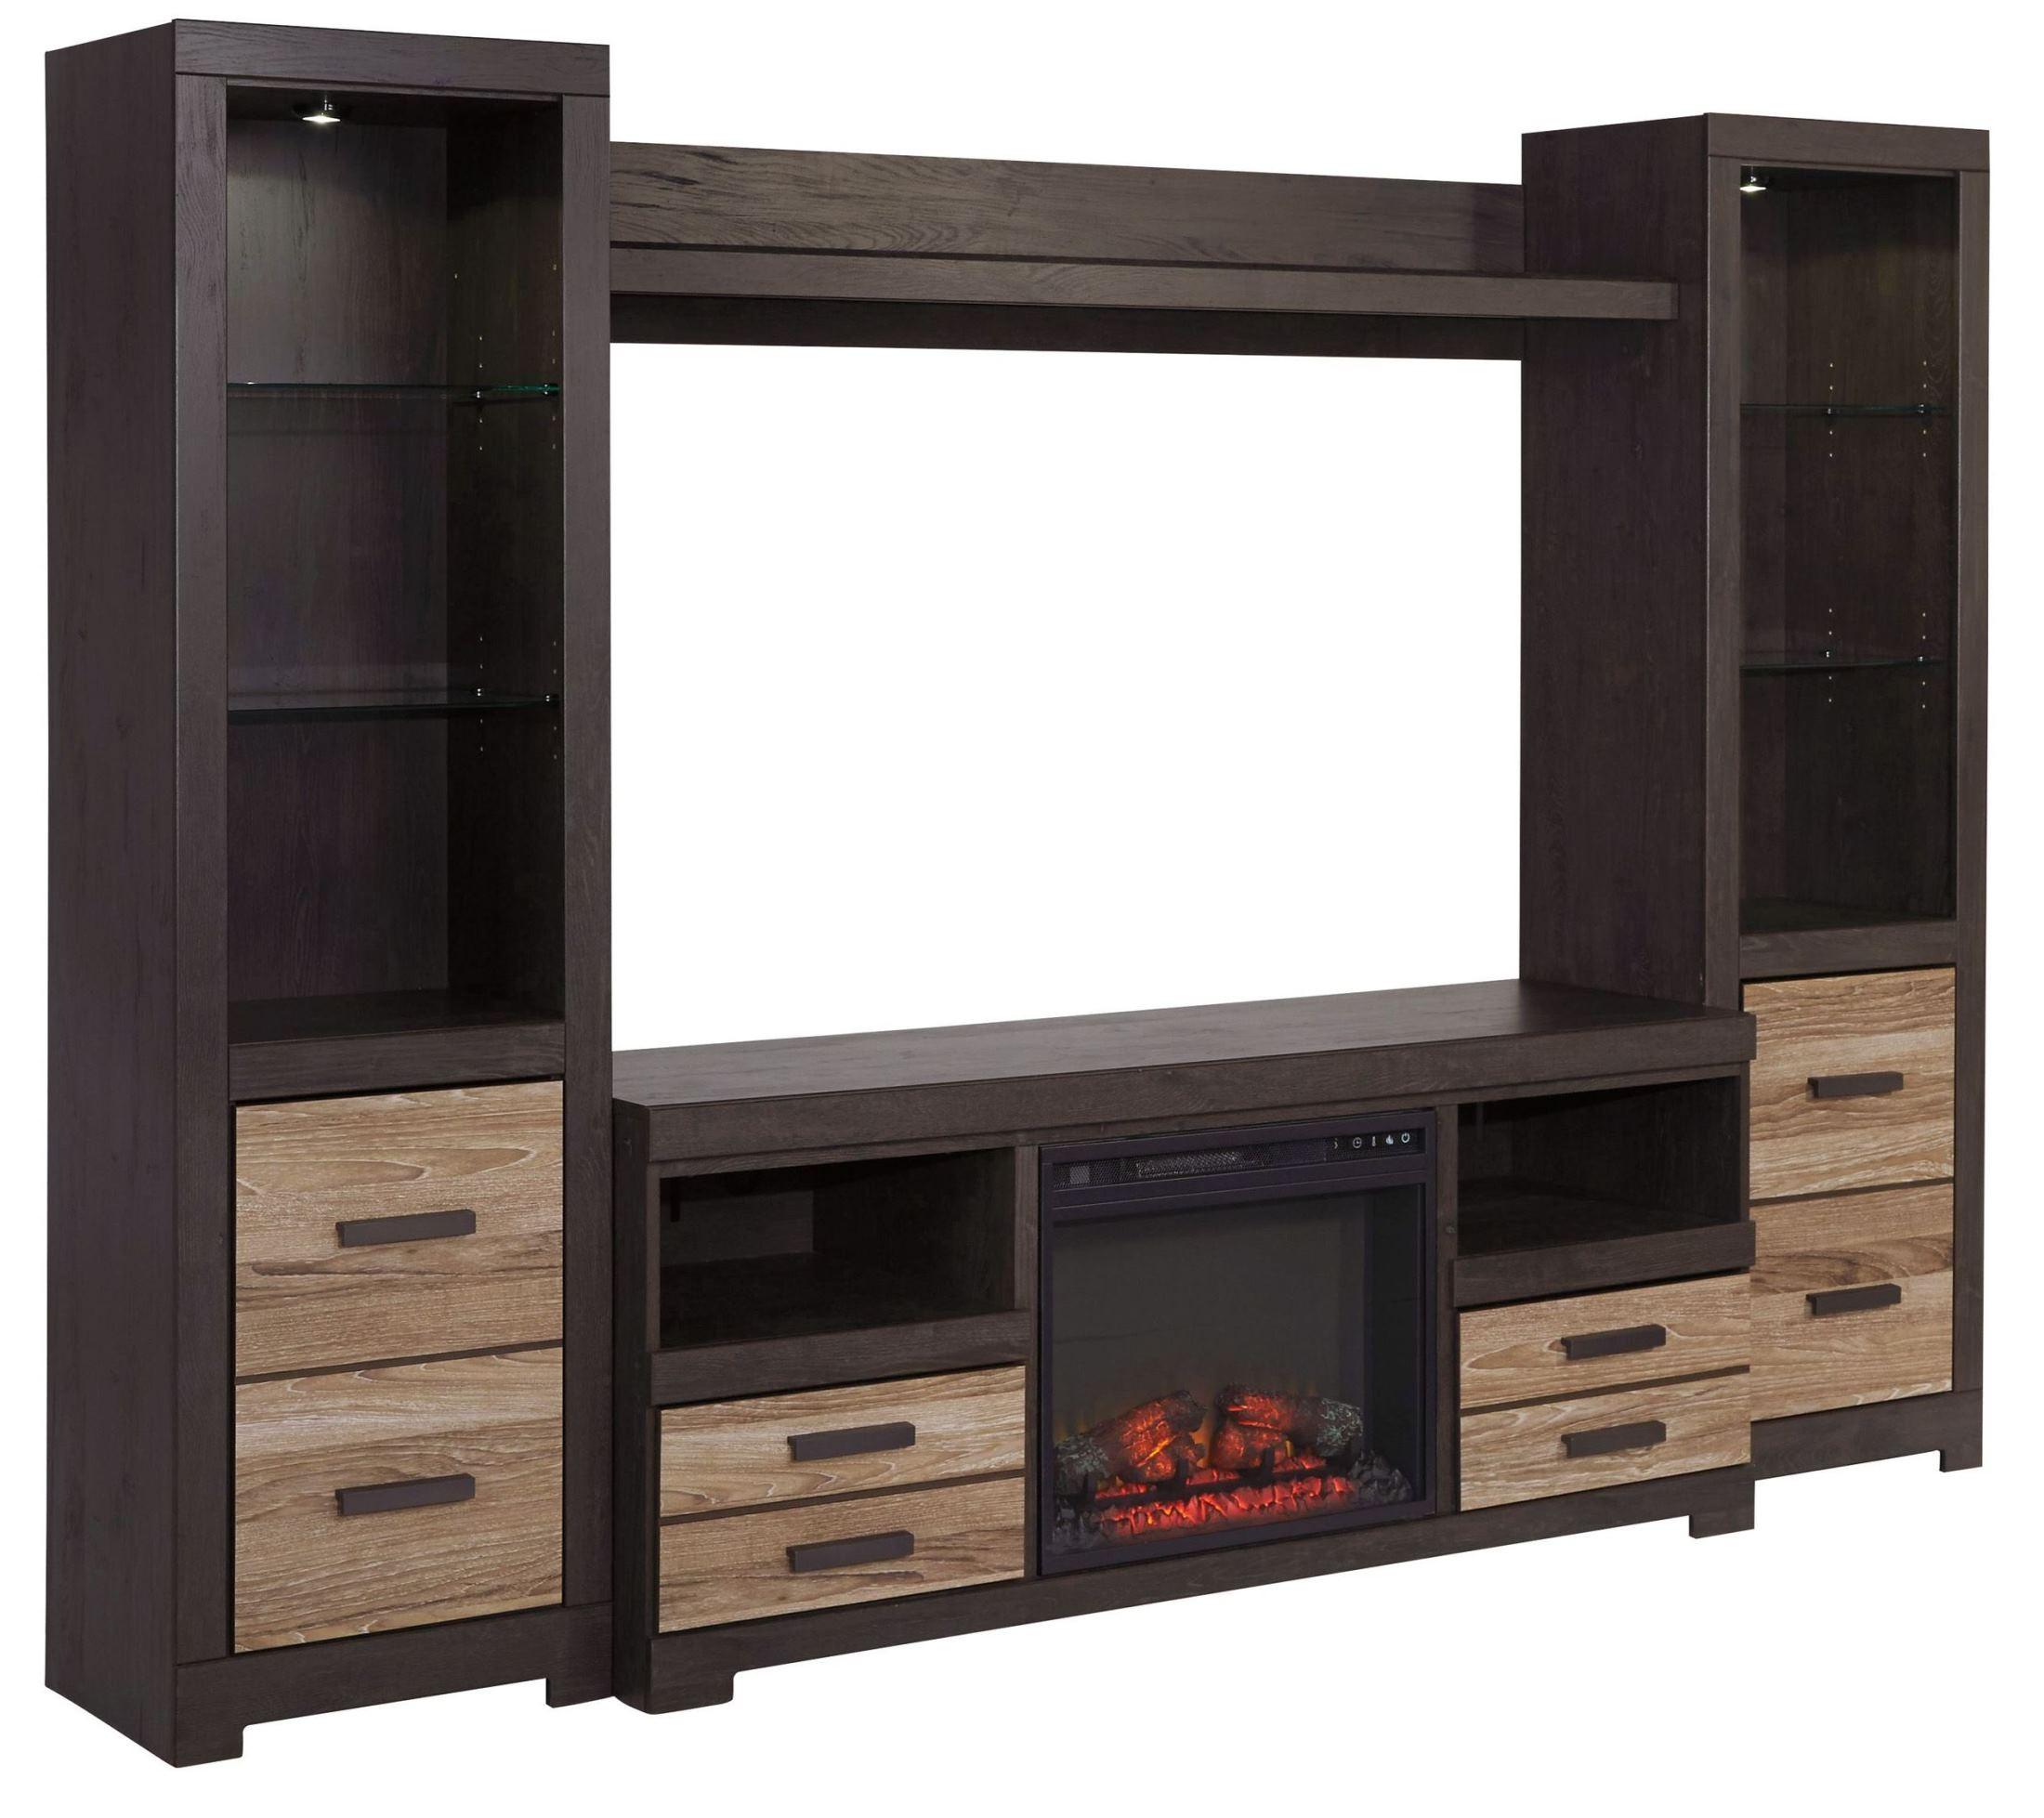 Harlinton Entertainment Wall Unit W325 68 24 2 27 Ashley Furniture